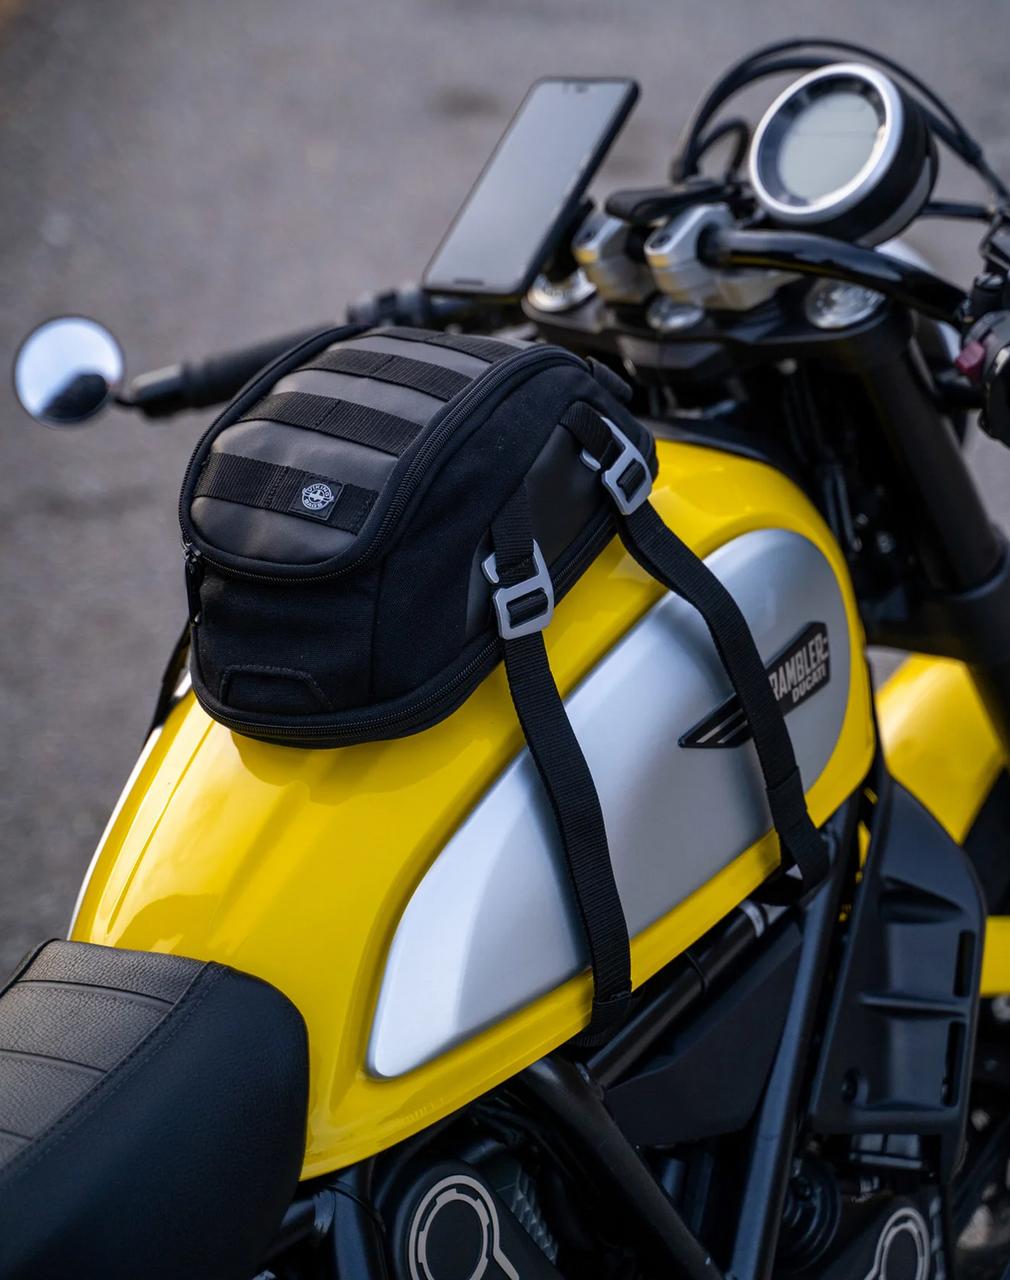 Viking Bonafide Black Motorcycle Cafe Racer Tank Bag Bag on bike view